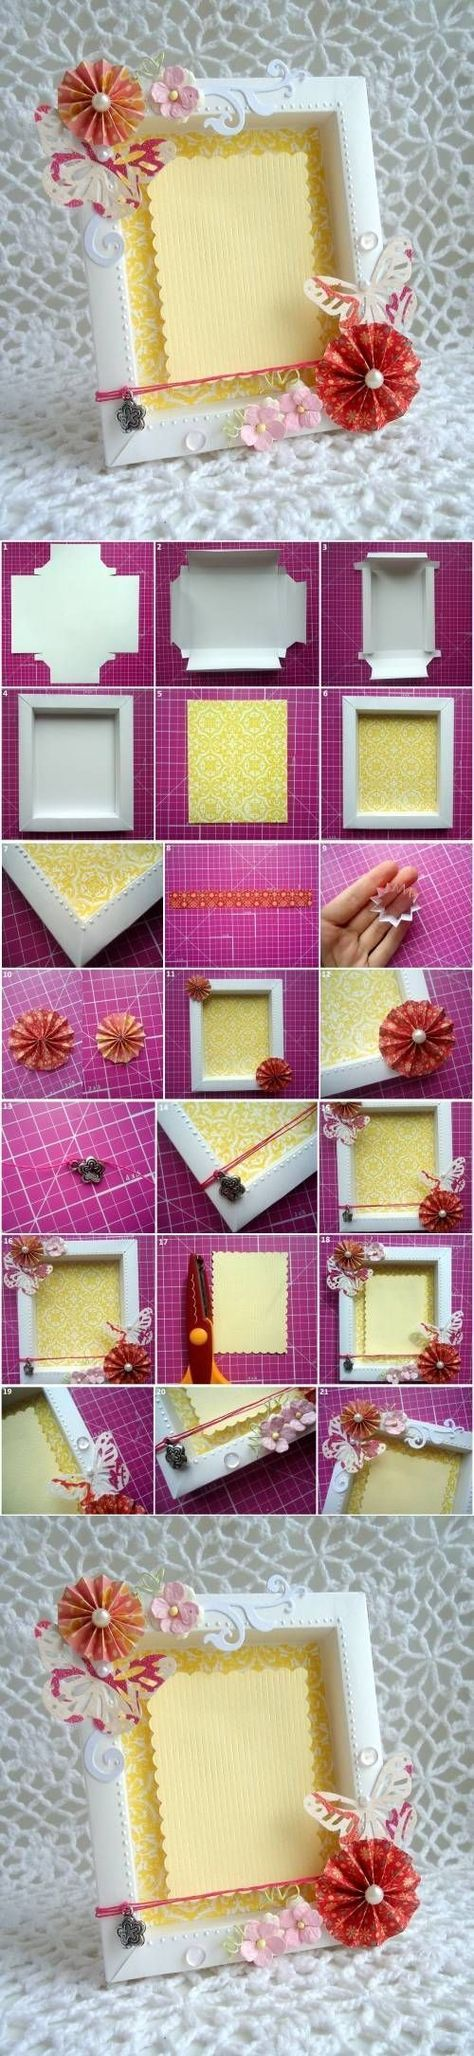 DIY Cute Cardboard Picture Frame   iCreativeIdeas.com Like Us on Facebook ==> https://www.facebook.com/icreativeideas: